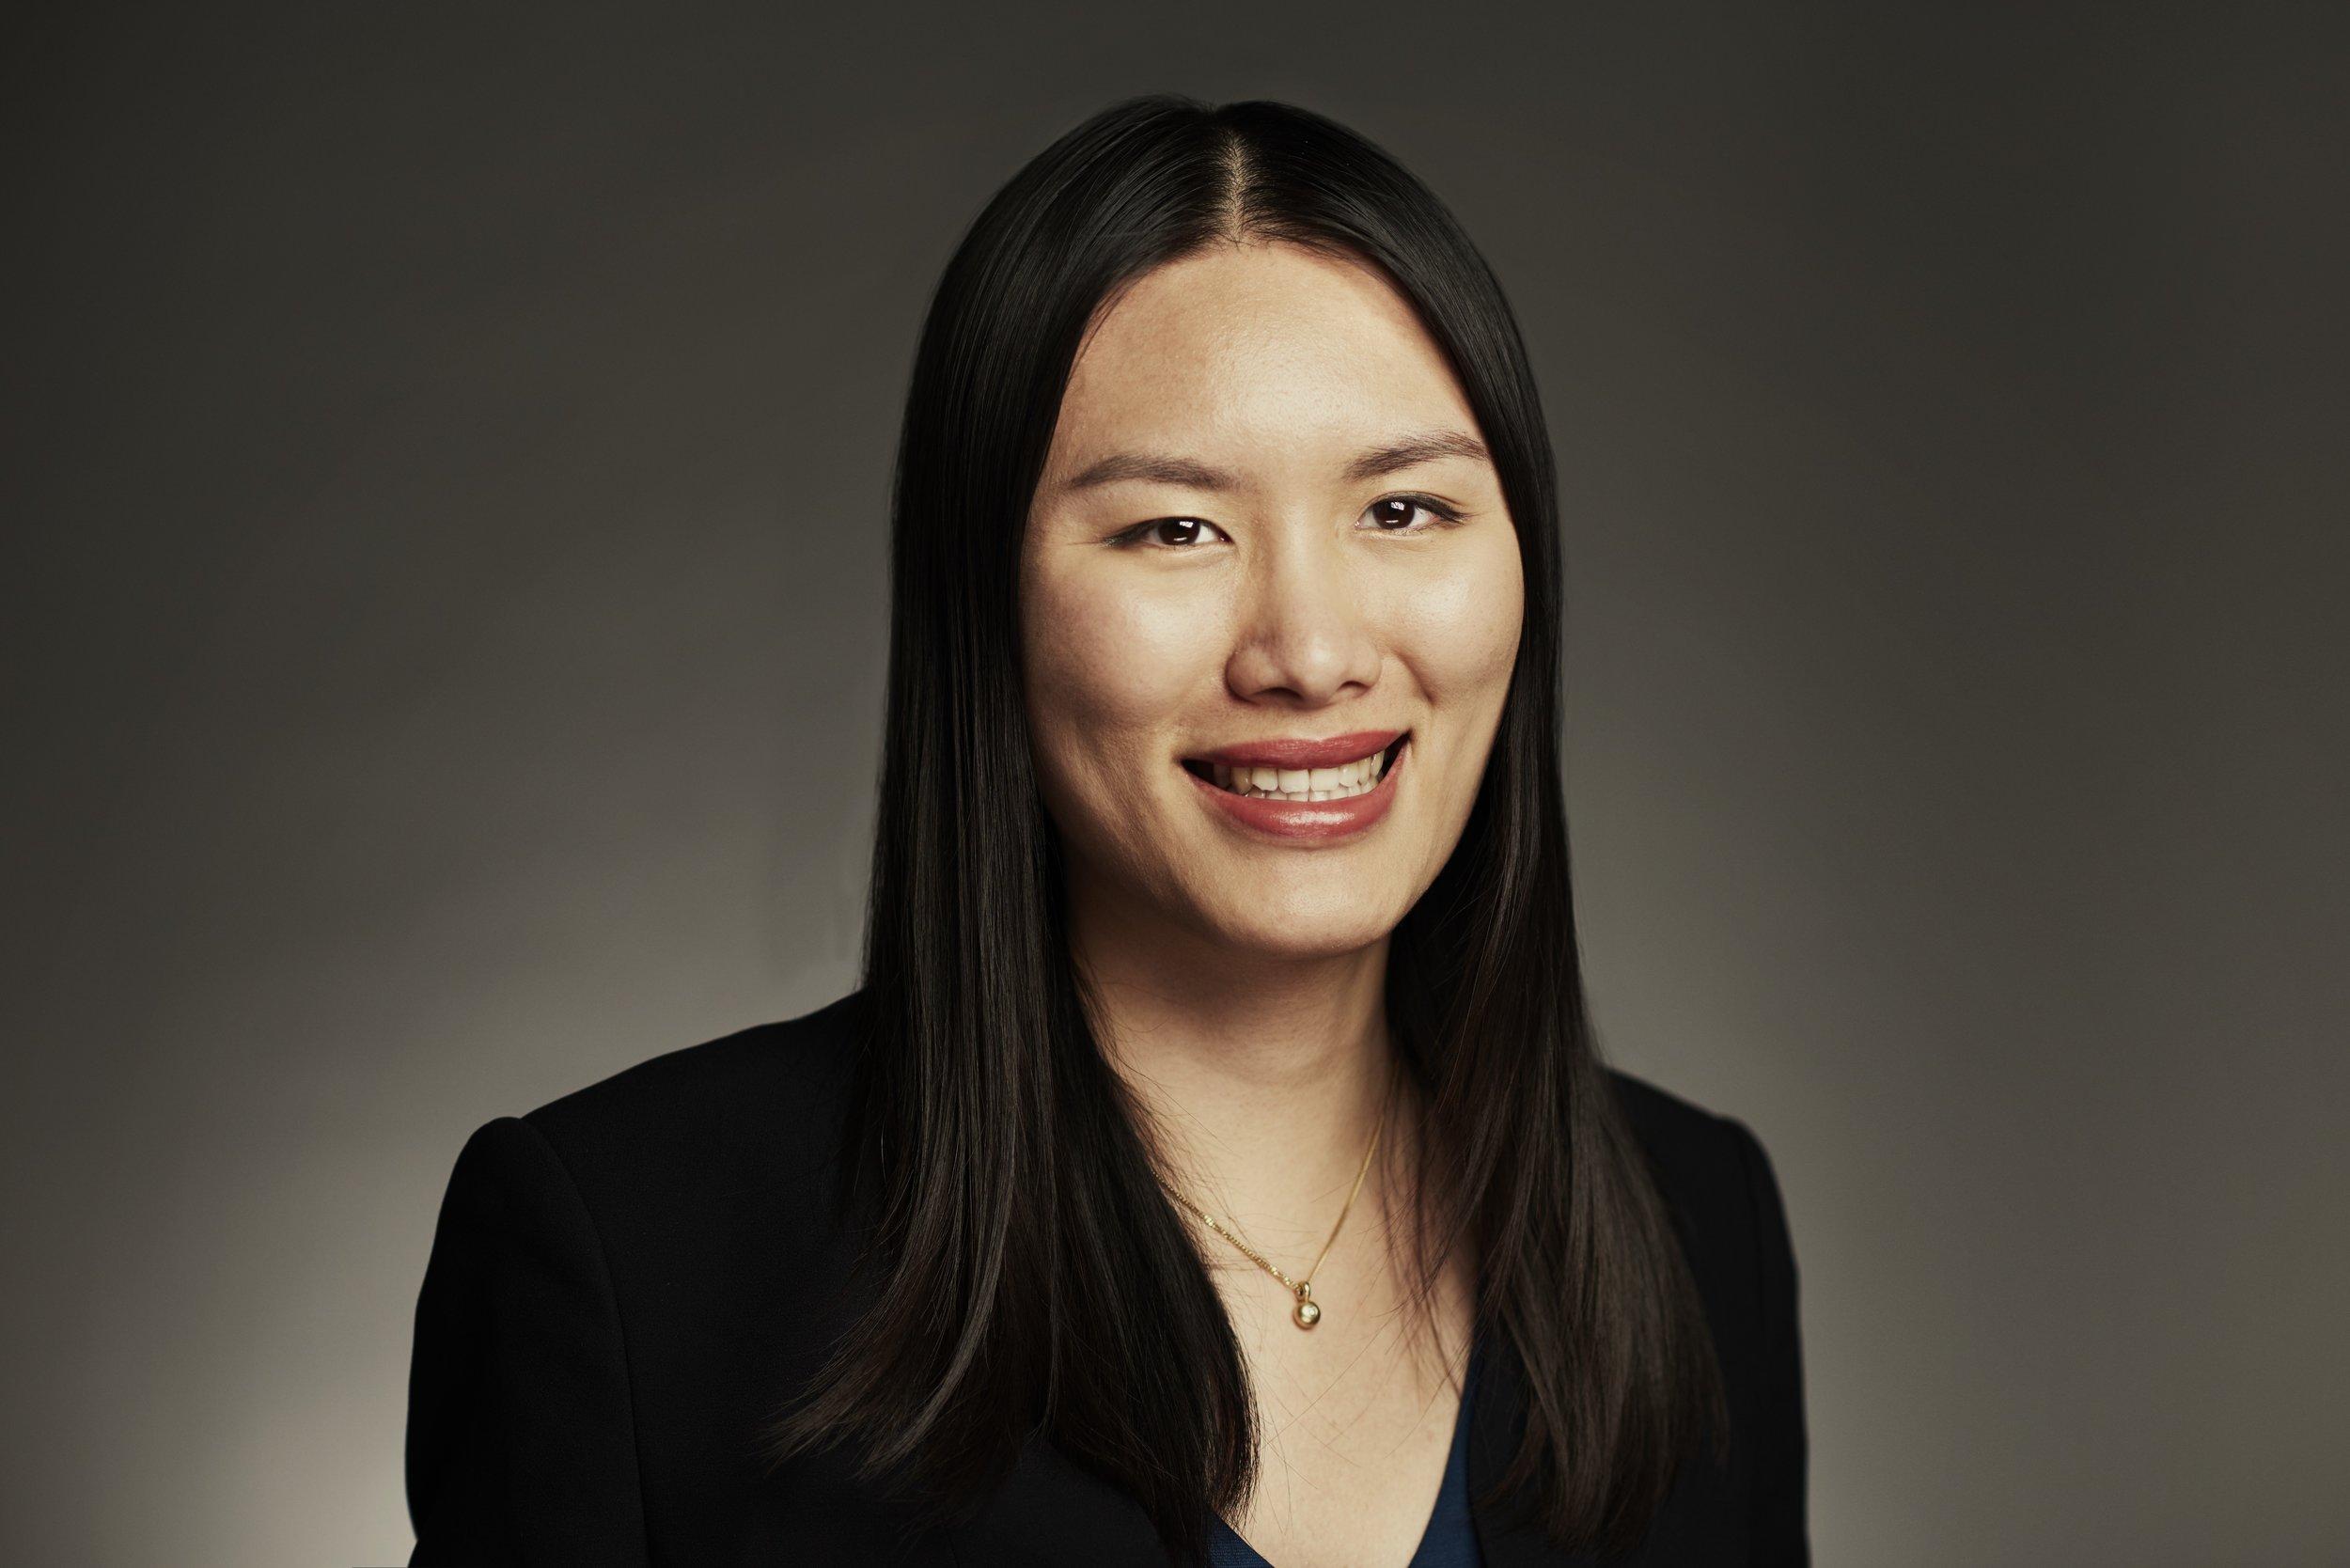 Portrait_Jill Xiaozhou Ju (1) - Jade Bentham.jpg